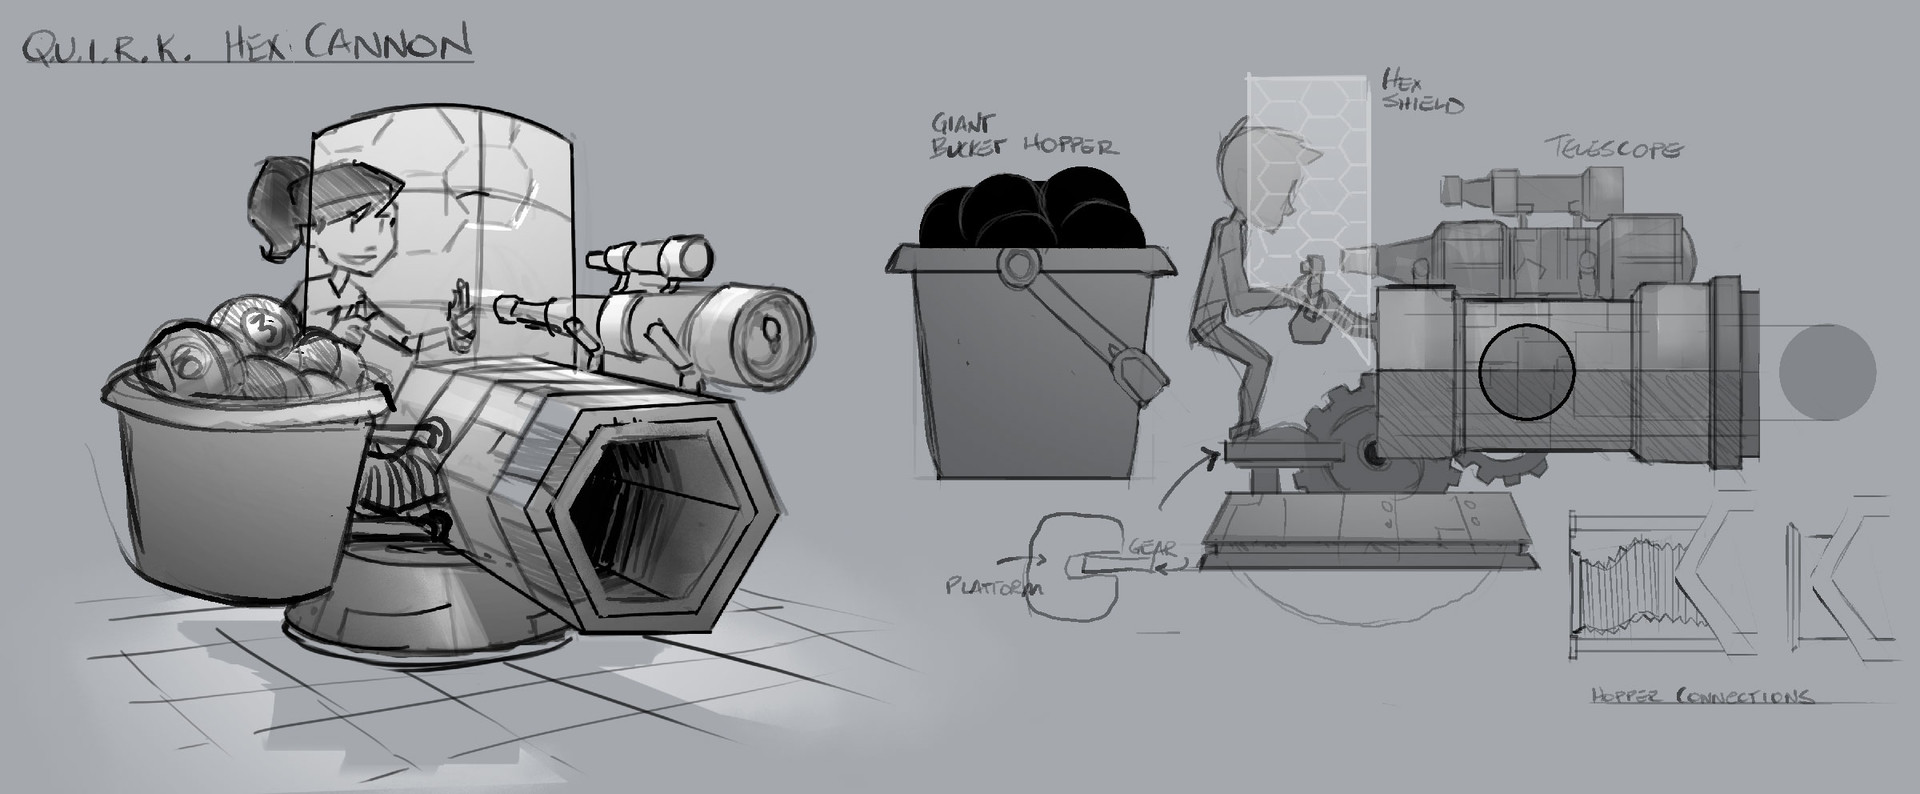 Hex Cannon Turret - Weapon/Prop Concept